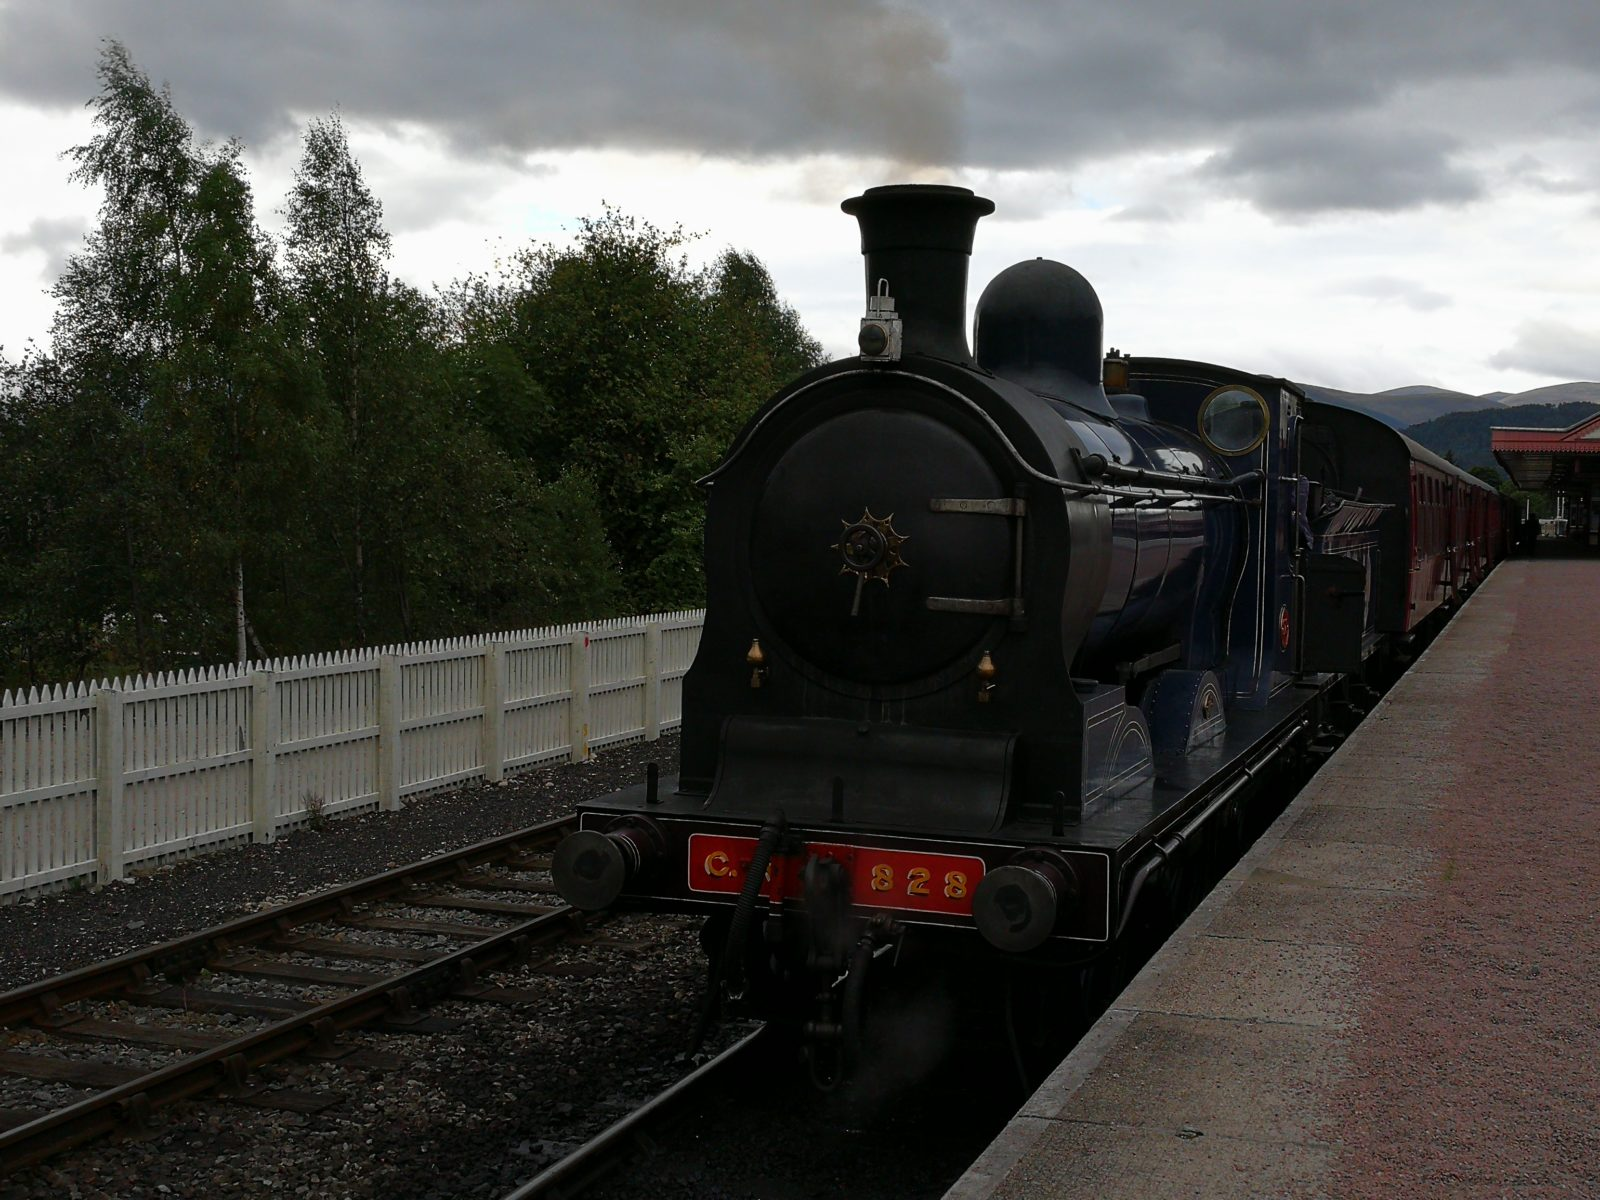 Strathspey Railway à Aviemore, Ecosse